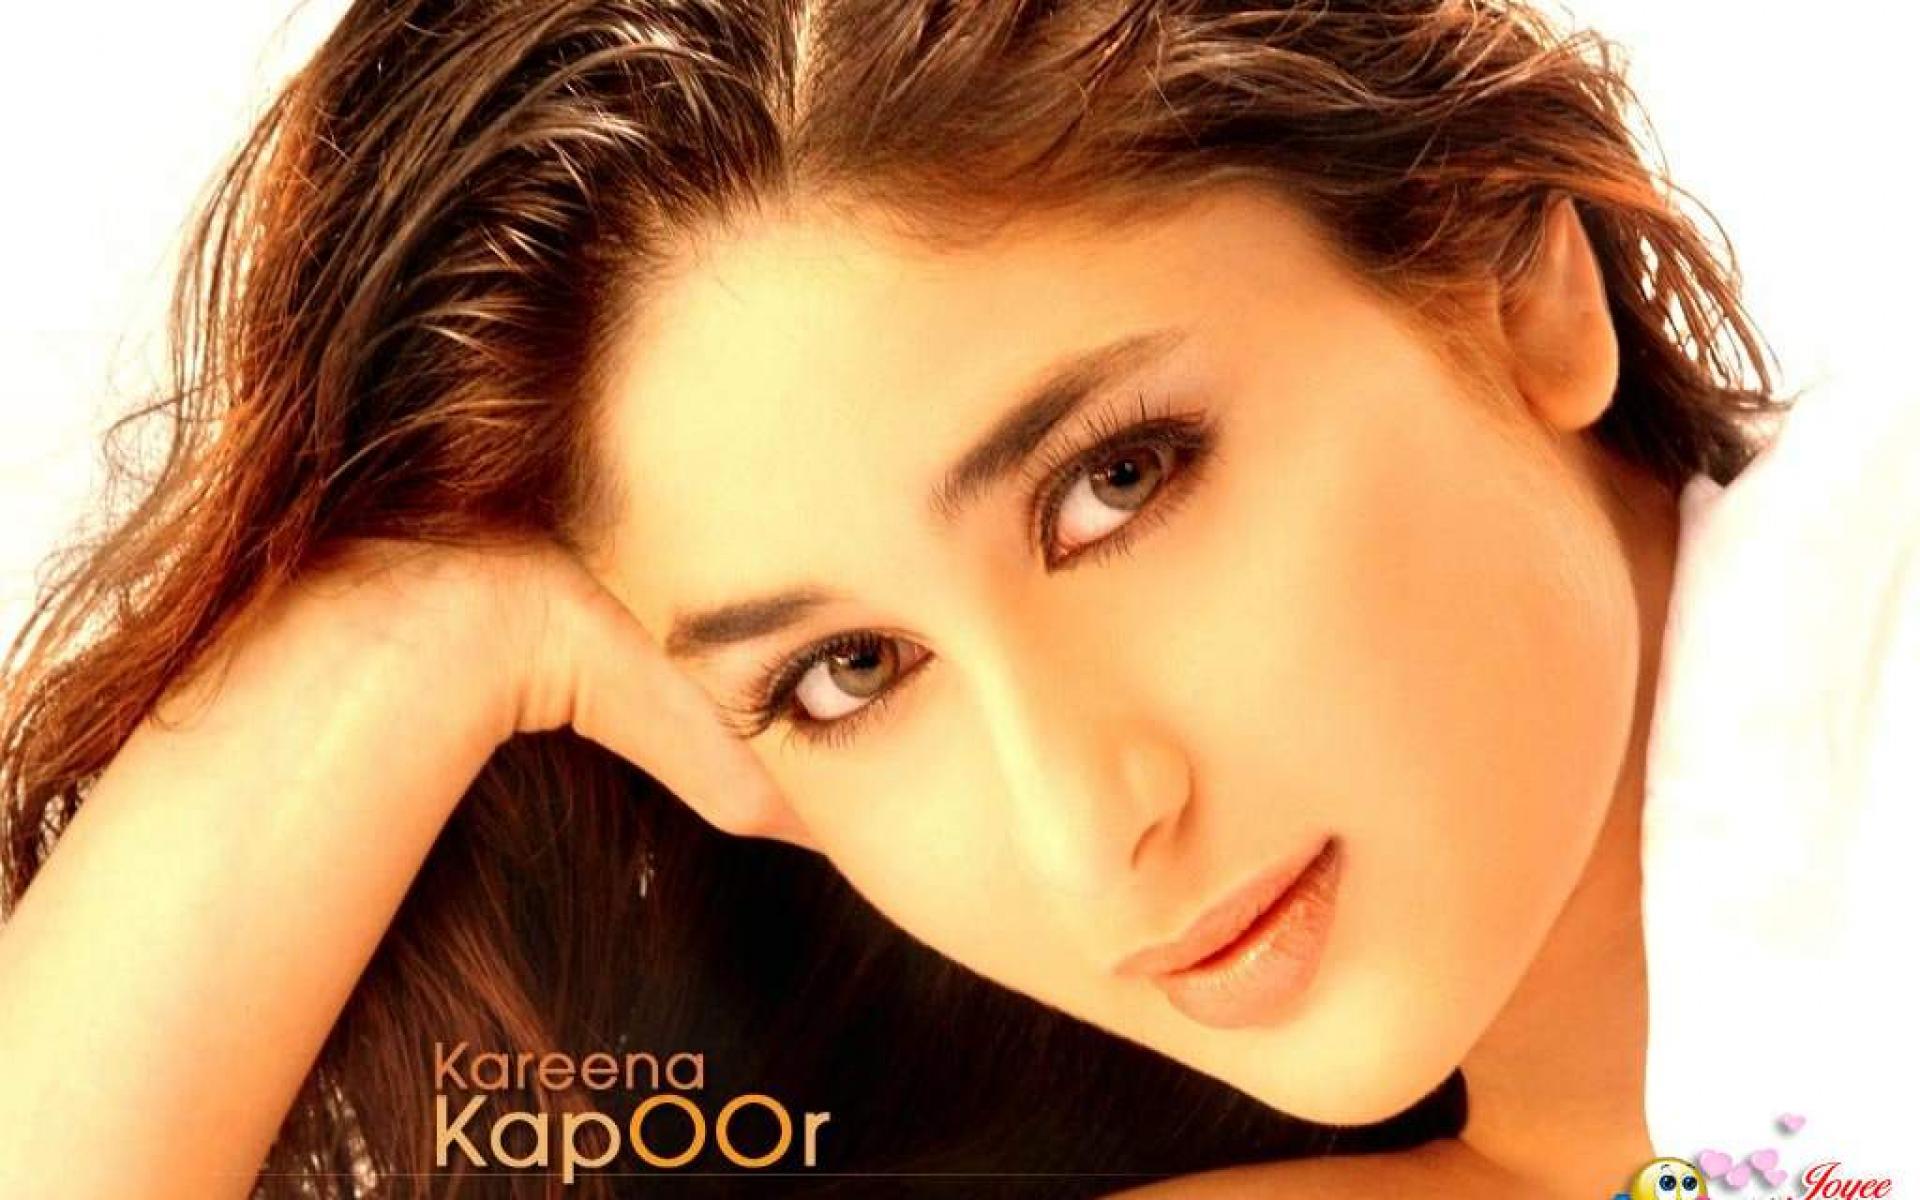 Kareena Kapoor Wallpapers Latest 2015 HD 1920x1200